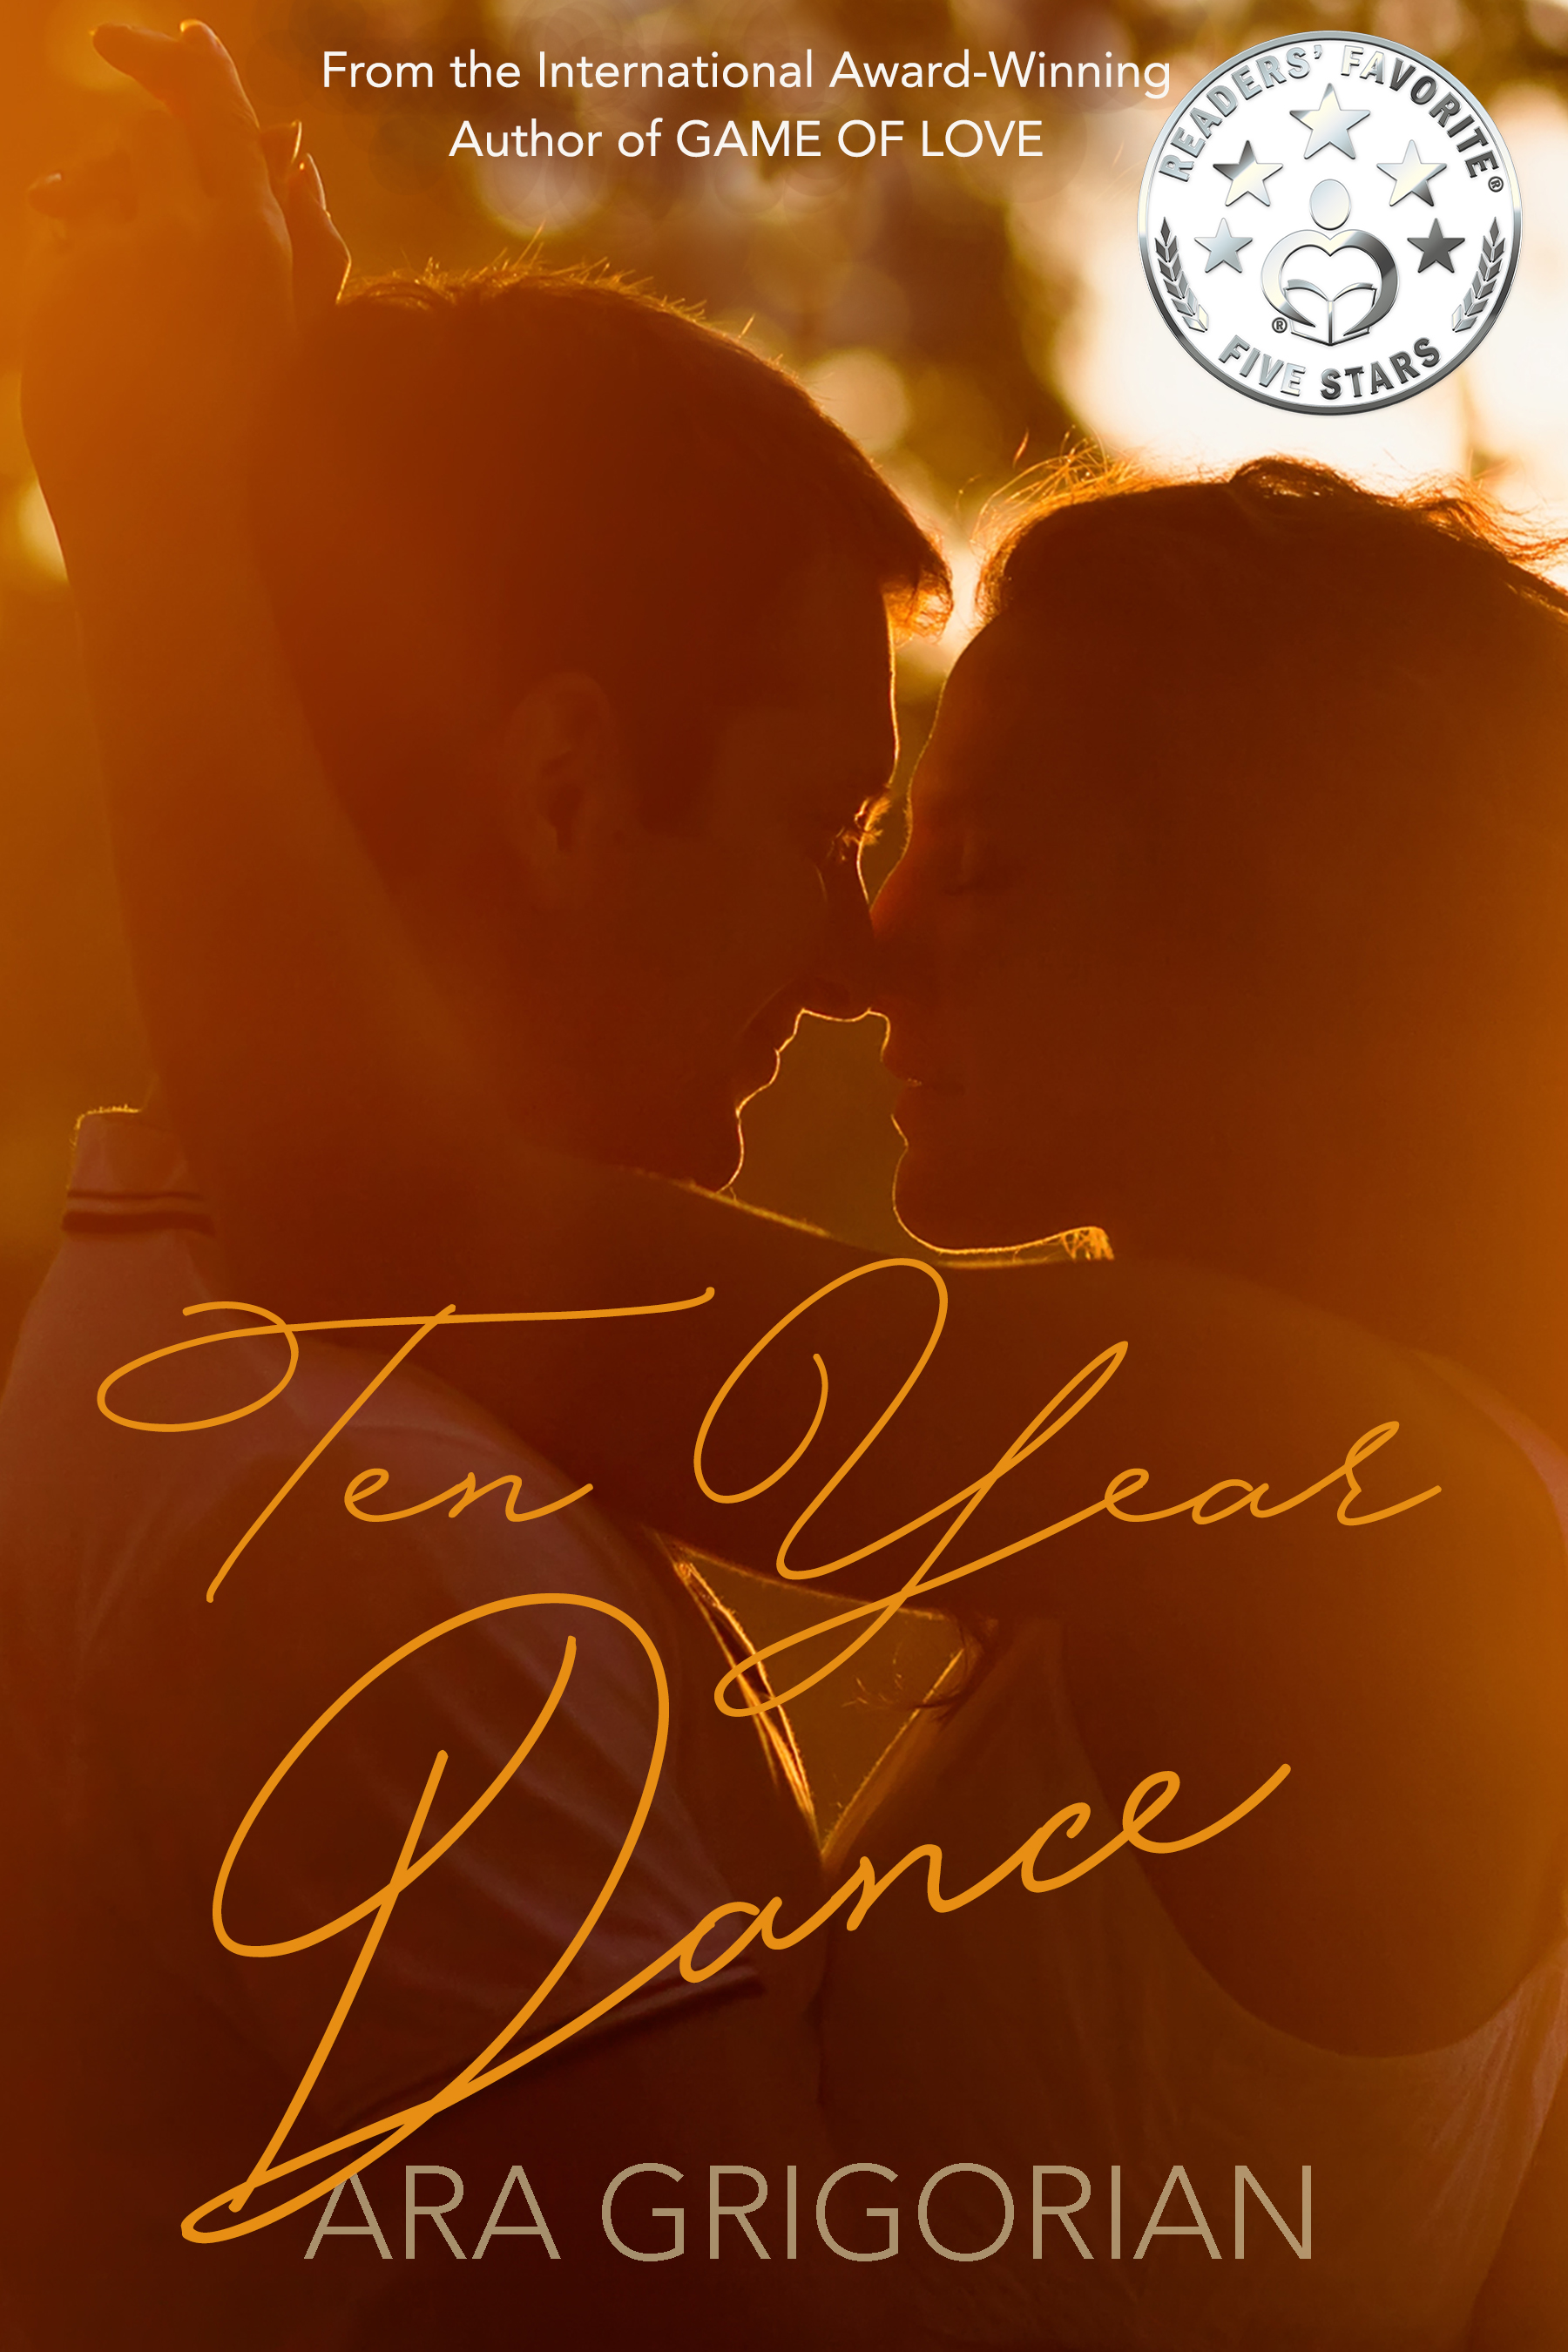 TEN YEAR DANCE Cover Reveal